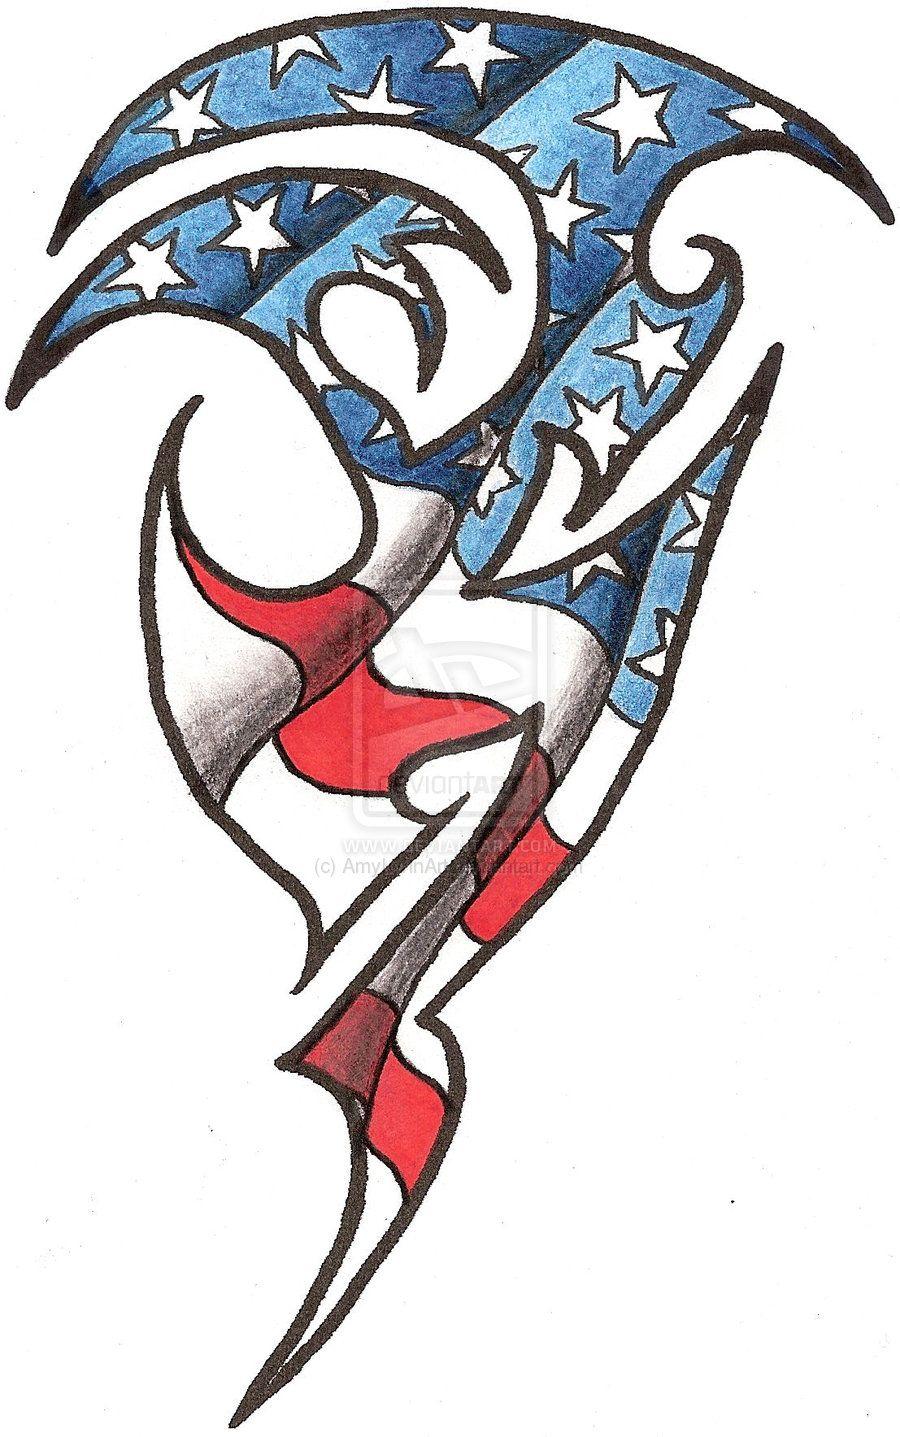 American Tribal Flag Tattoos Modification Tattoos 2011 2013 Amylynnart Tribal Flag Tattoo I American Flag Tattoo Flag Tattoo American Flag Sleeve Tattoo